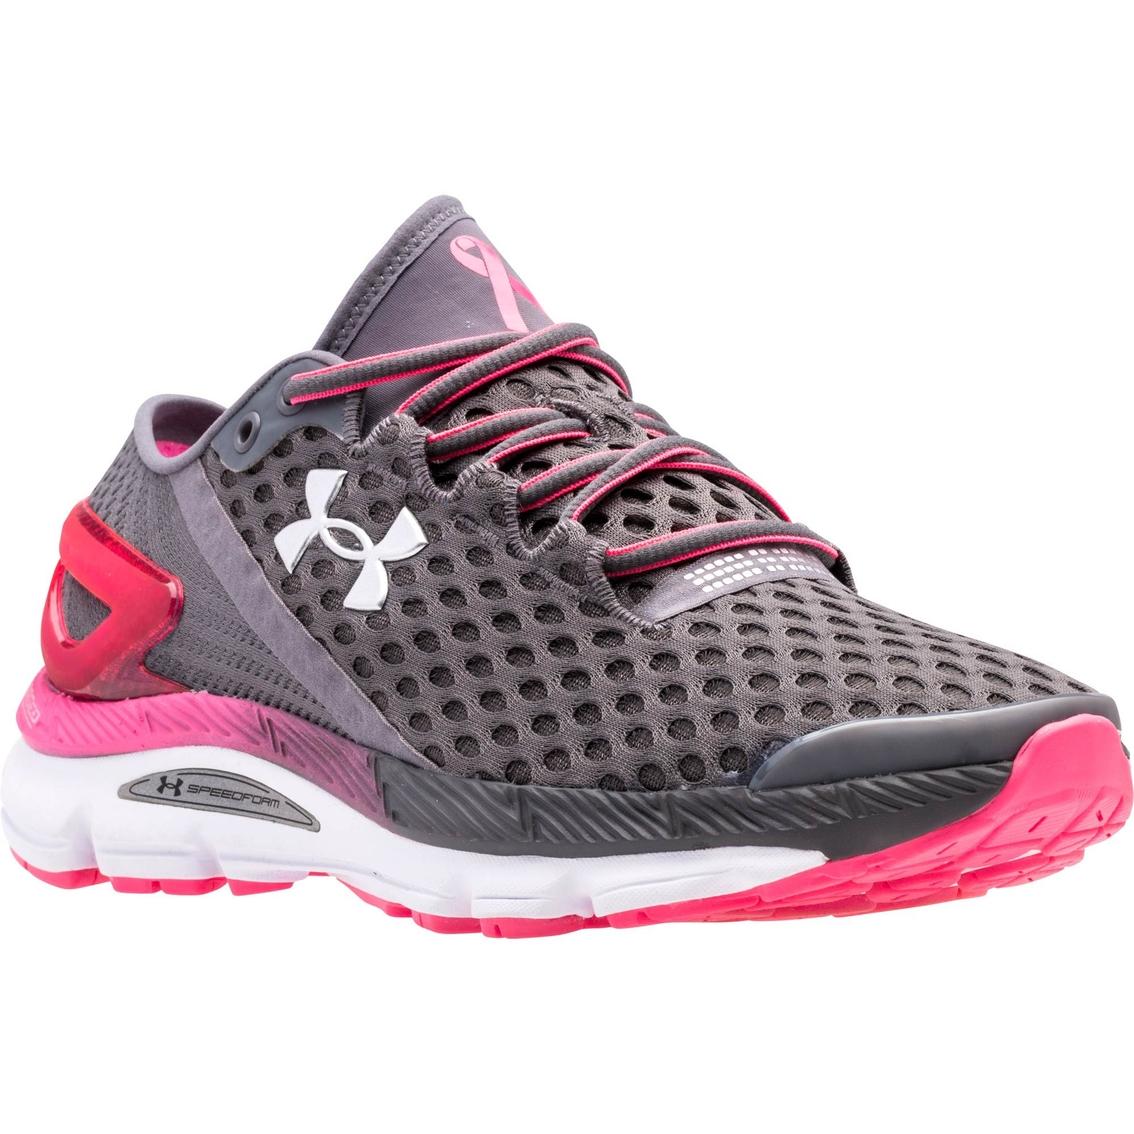 size 40 9ade2 77f14 Under Armour Women's Speedform Gemini 2 Running Shoes ...